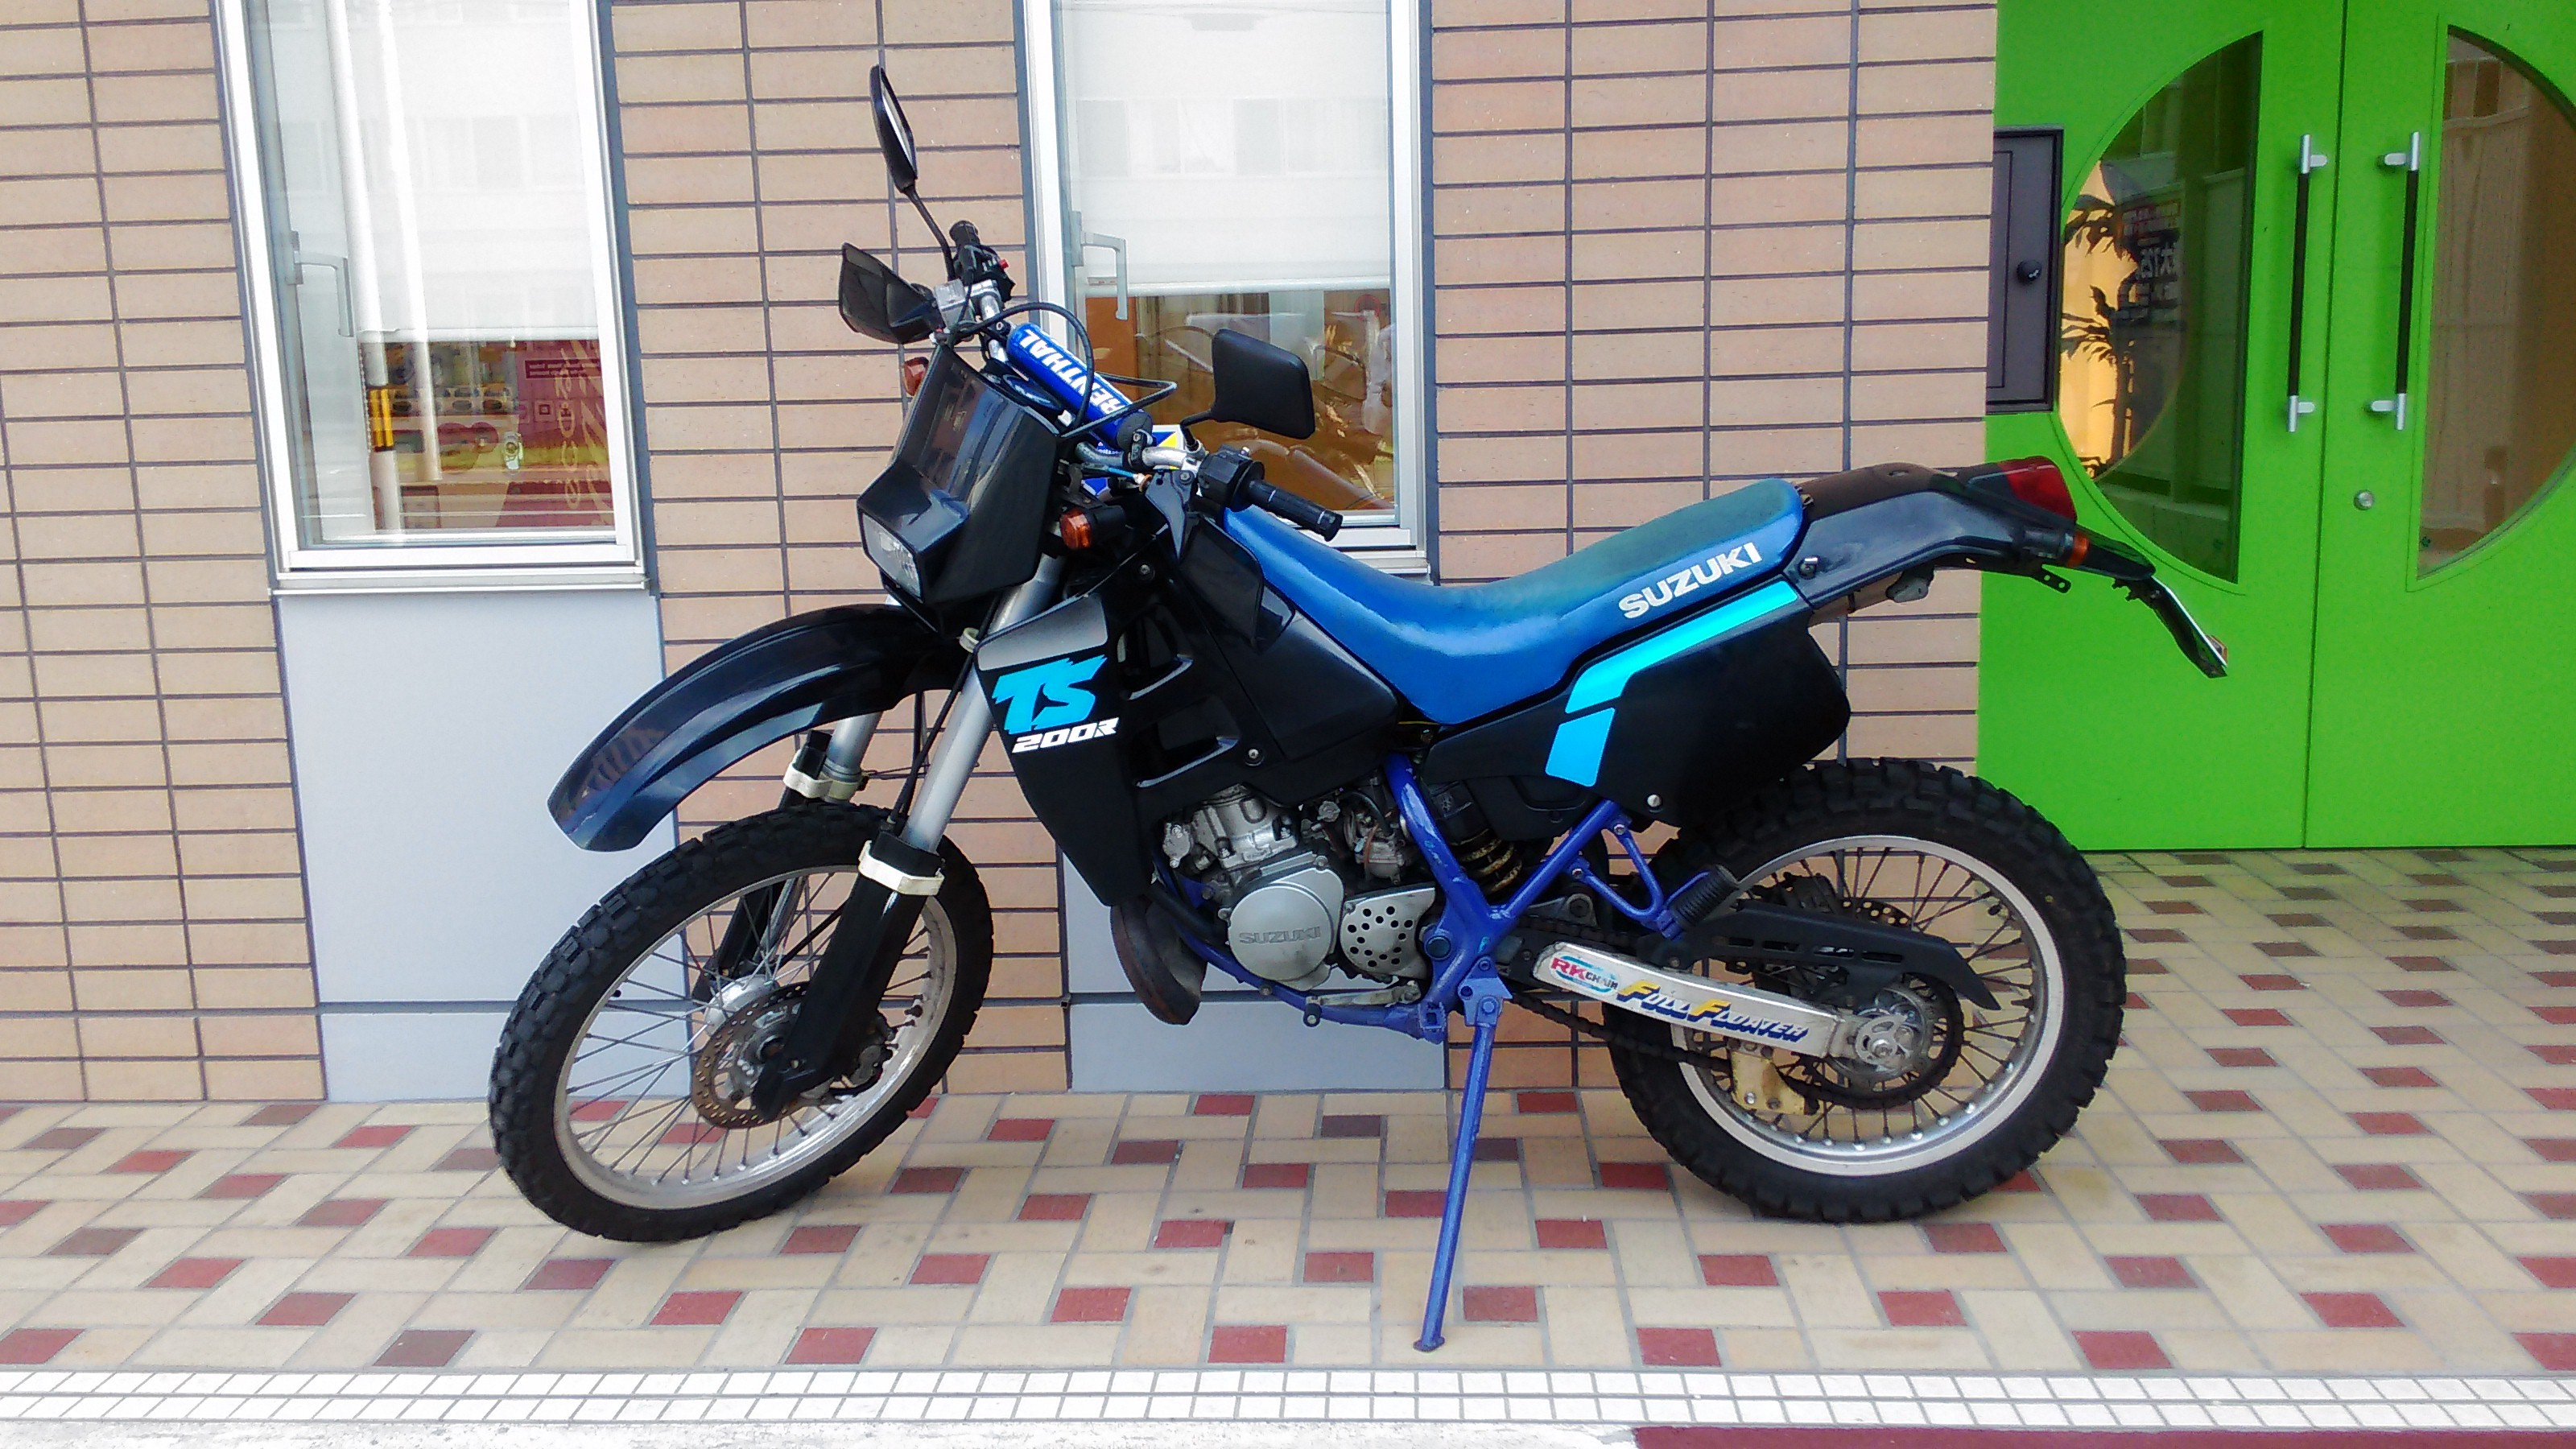 TS200R